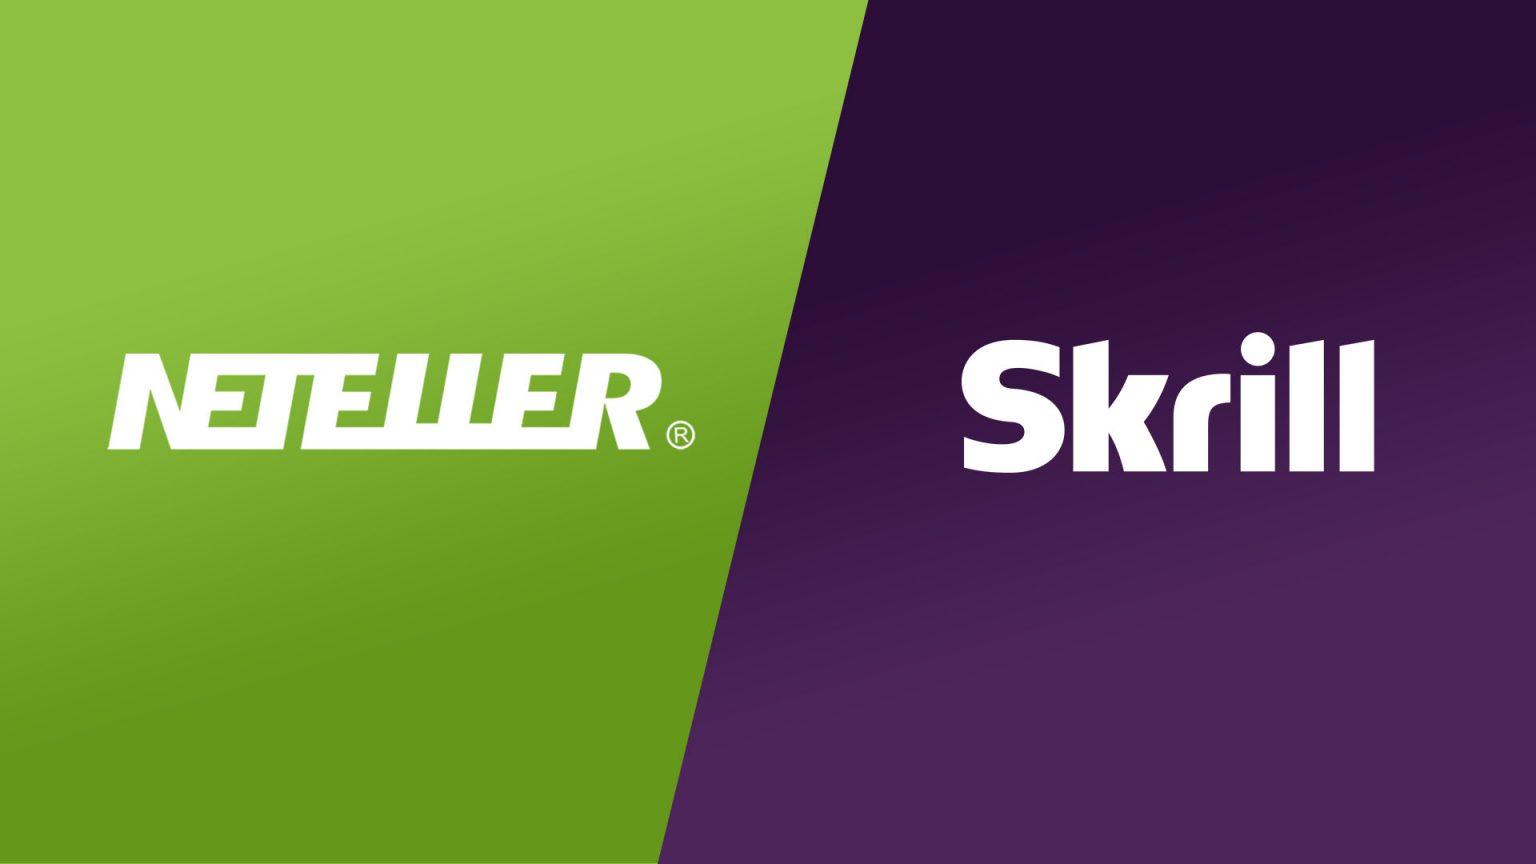 Neteller logo and Skrill logo